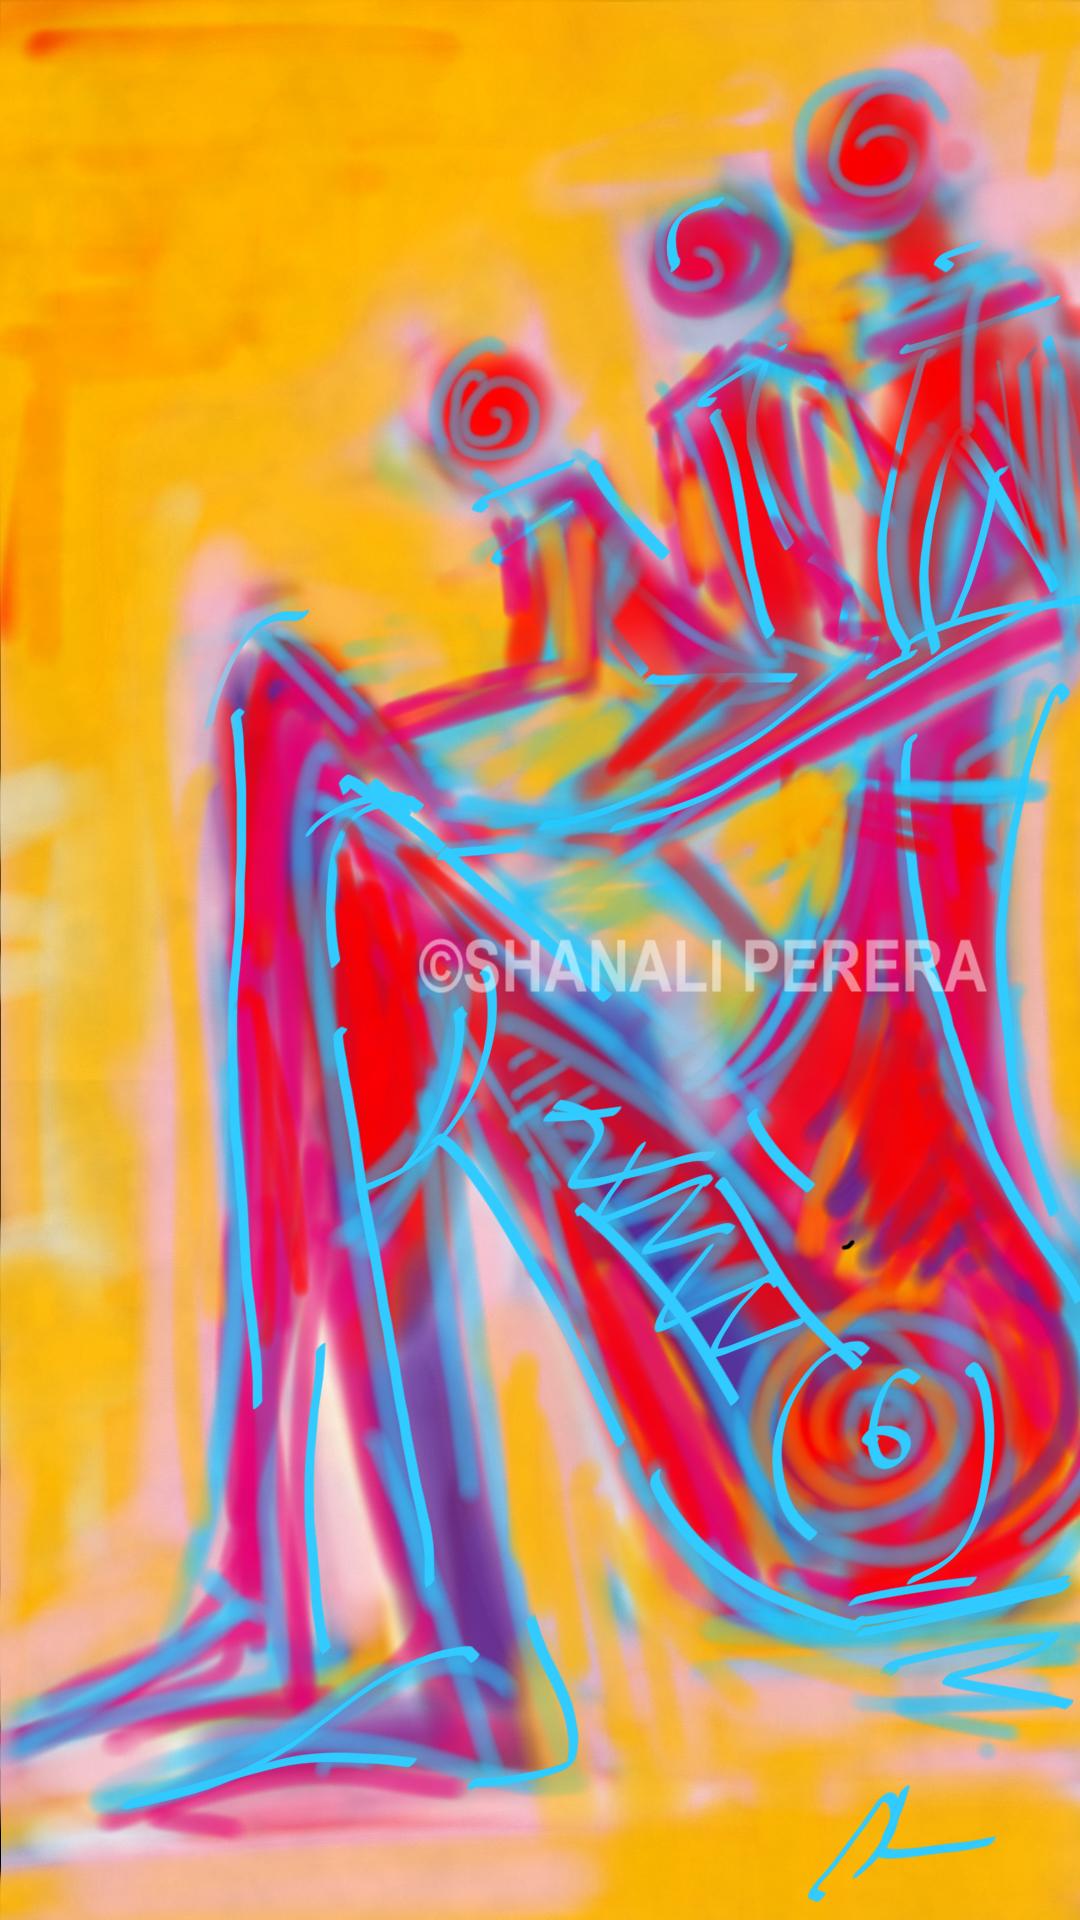 sketch-1511267518435.png